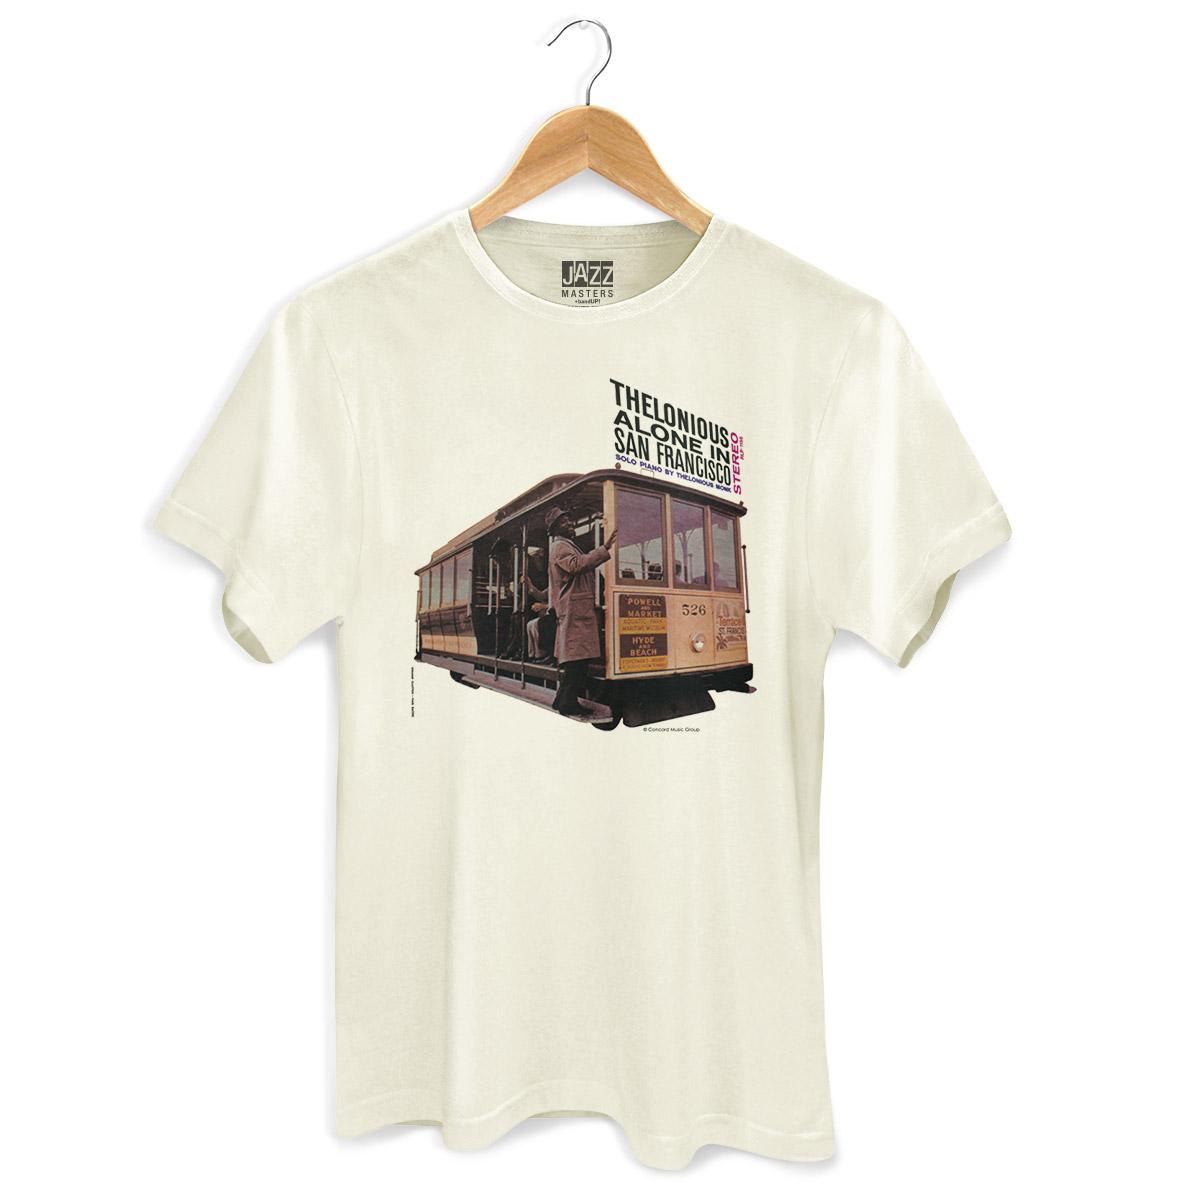 Camiseta Masculina Thelonious Monk Alone In San Francisco